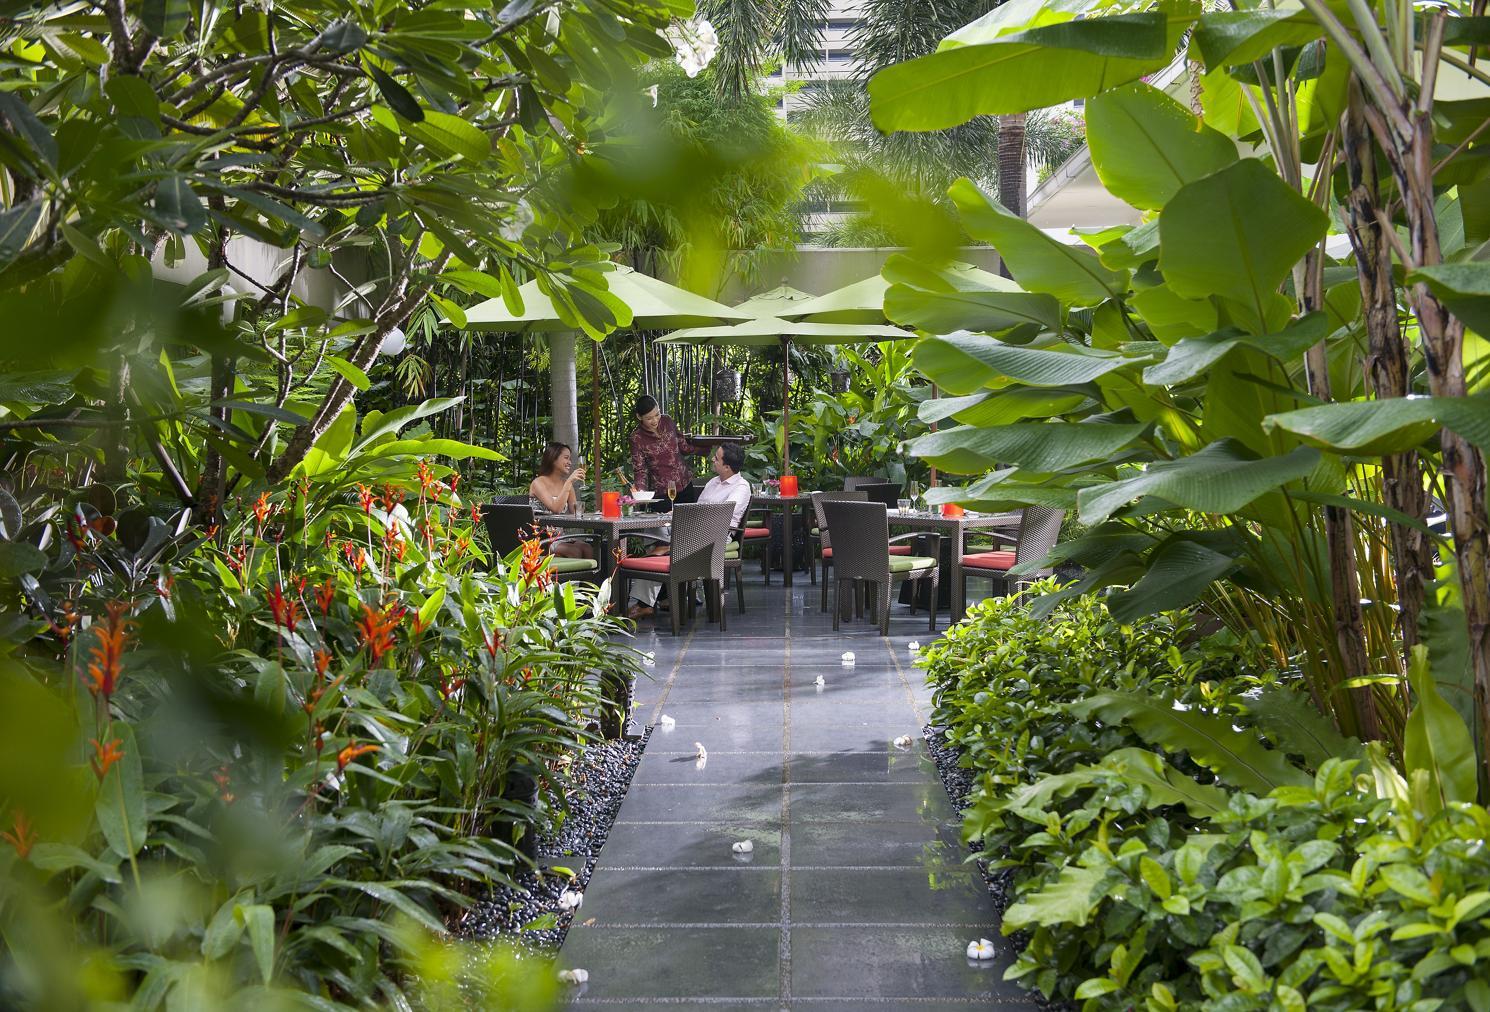 singapore-restaurant-melt-the-world-cafe-service-3.jpeg